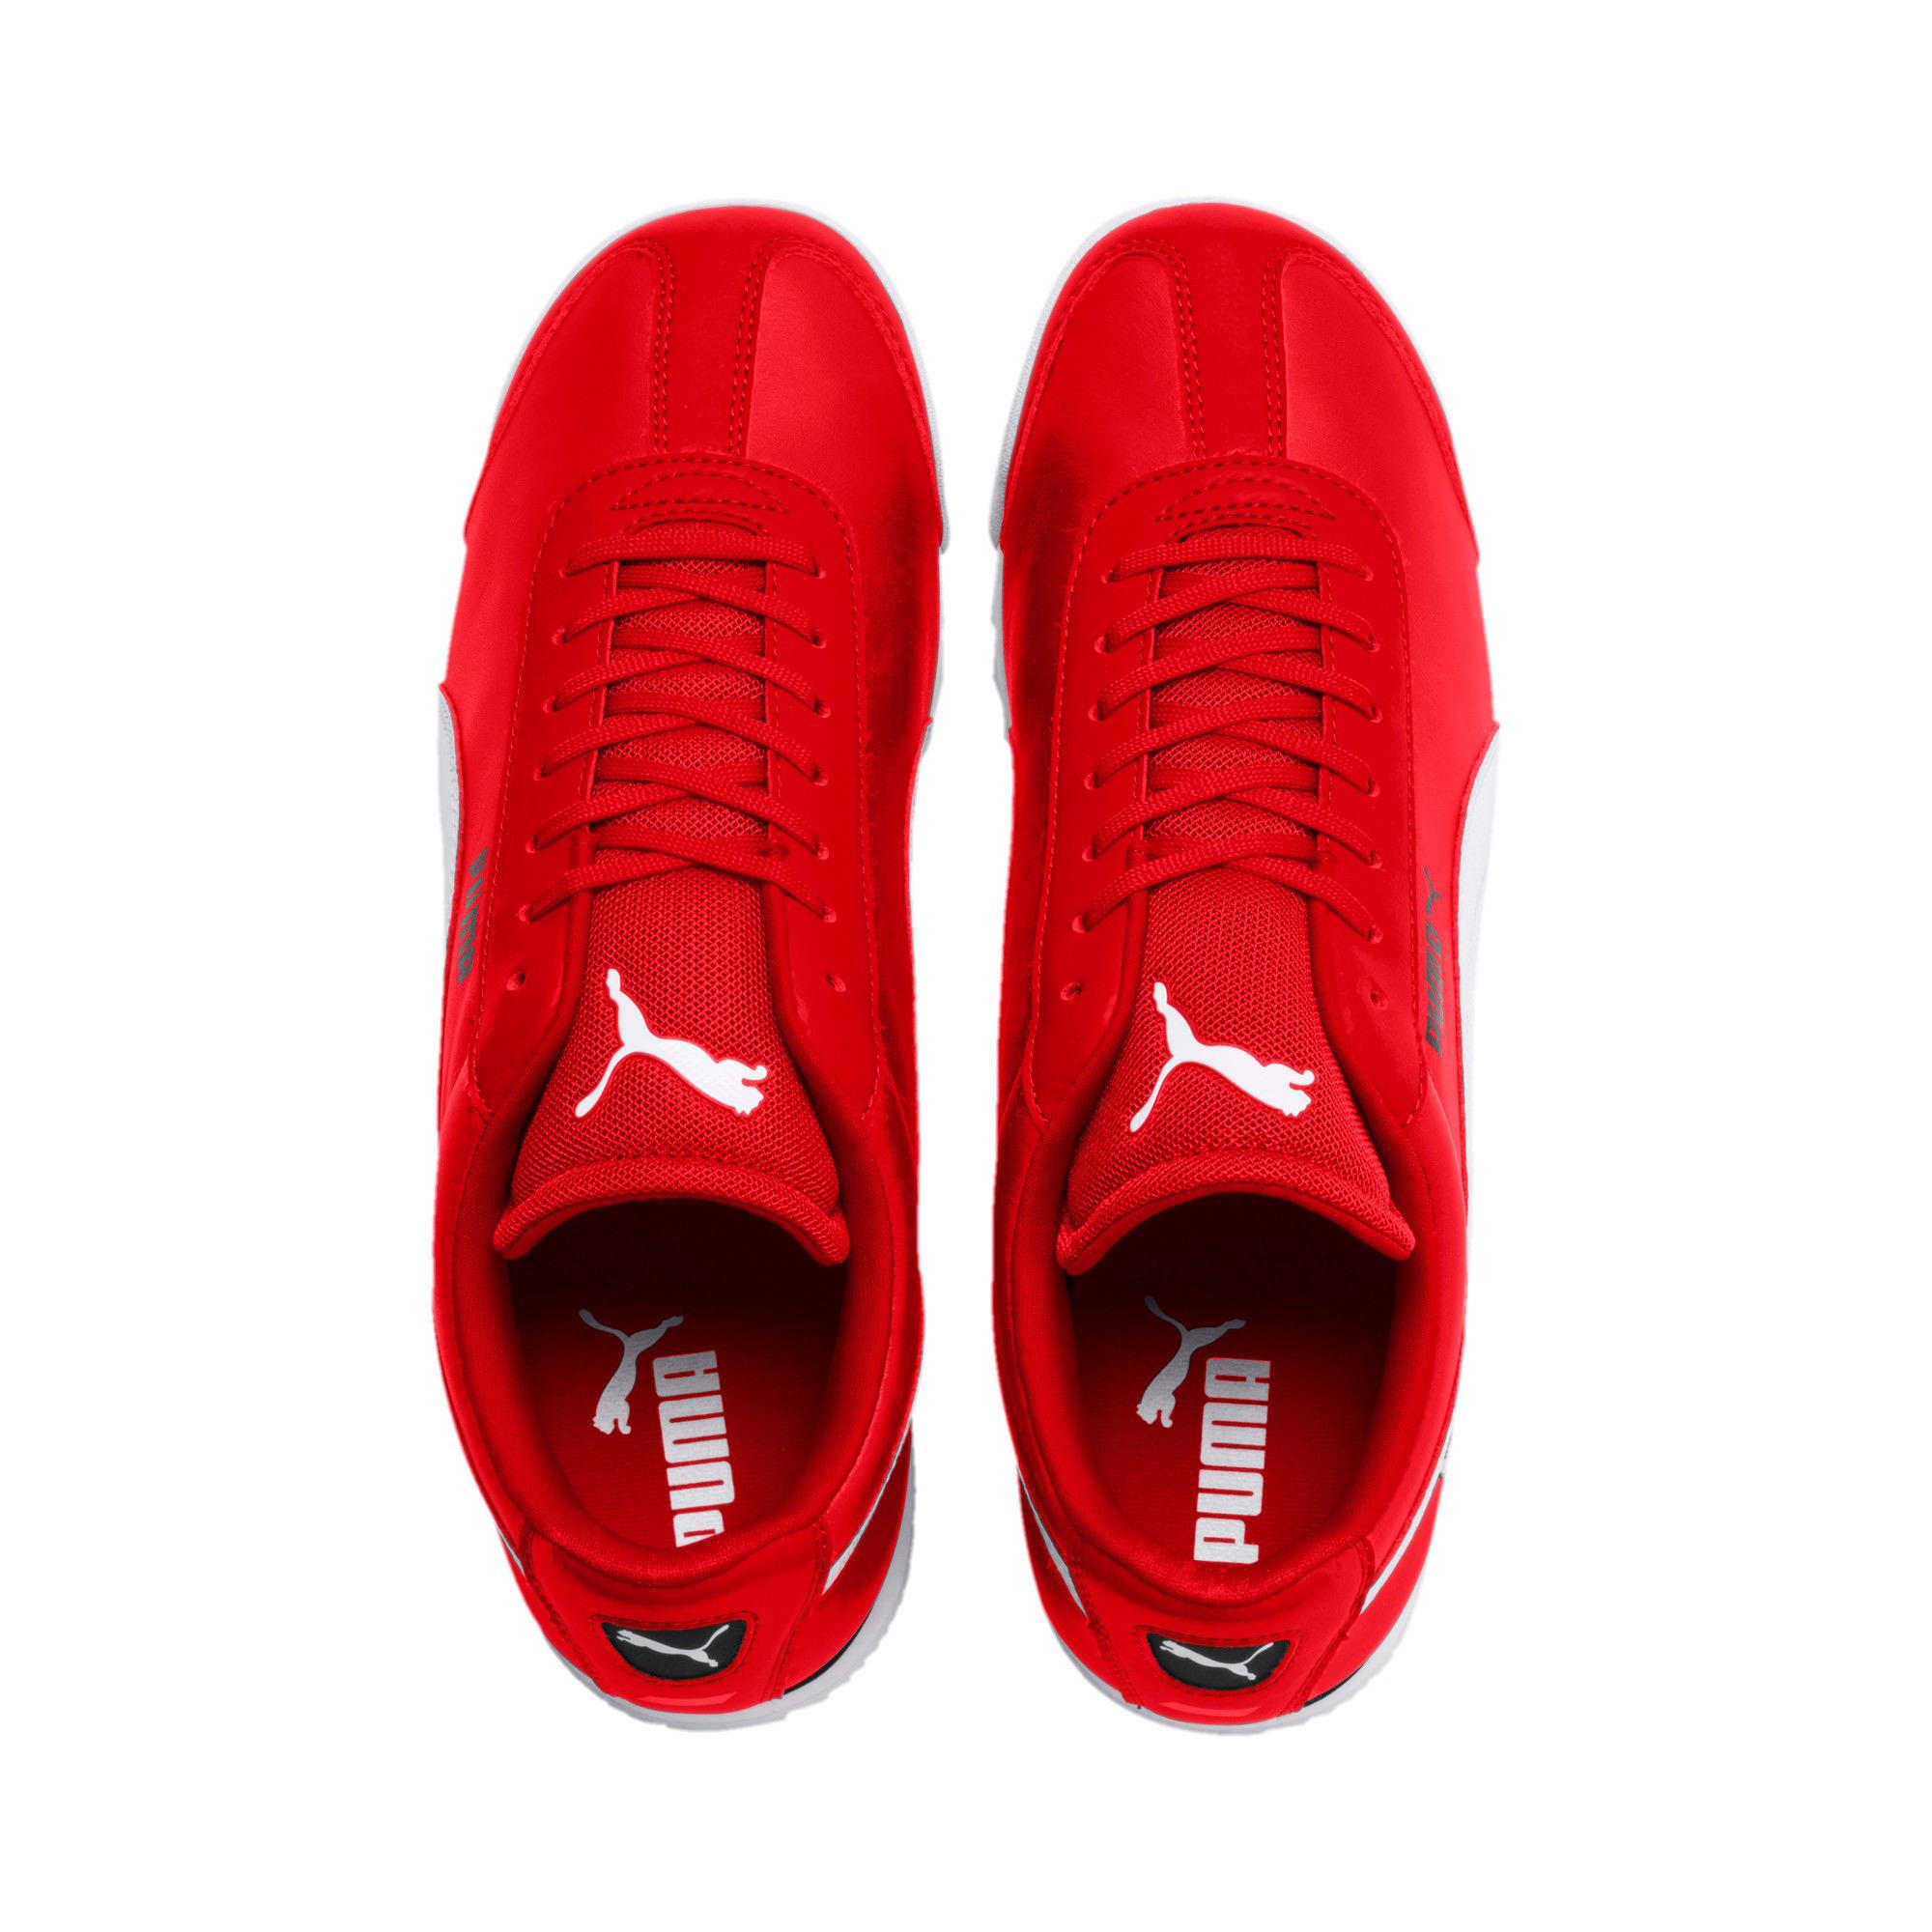 Thumbnail 7 of Scuderia Ferrari Roma Men's Sneakers, Rosso Corsa-White-Black, medium